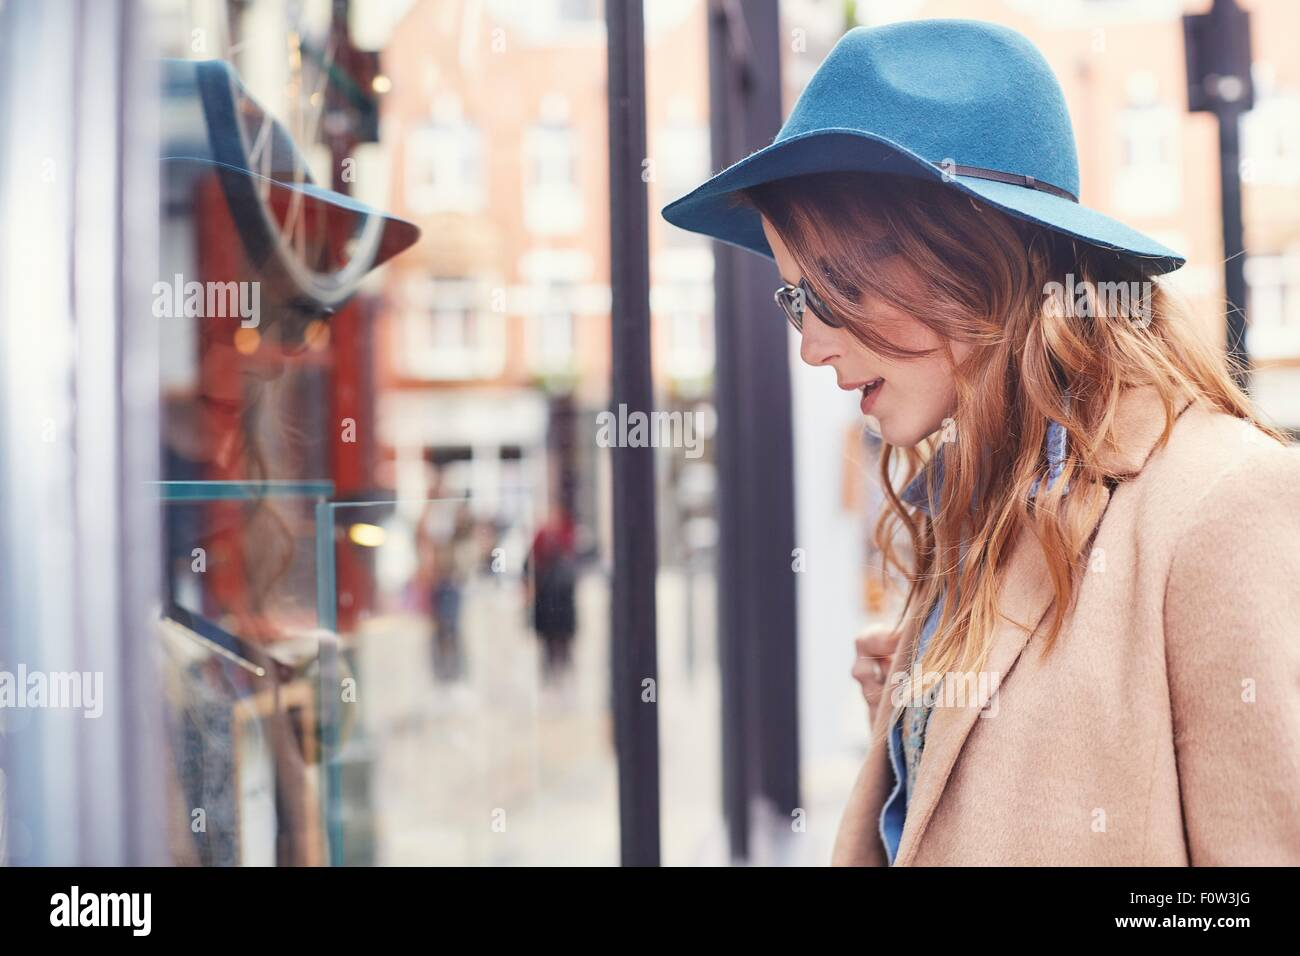 Stylish young female shopper looking at shop window, London, UK - Stock Image